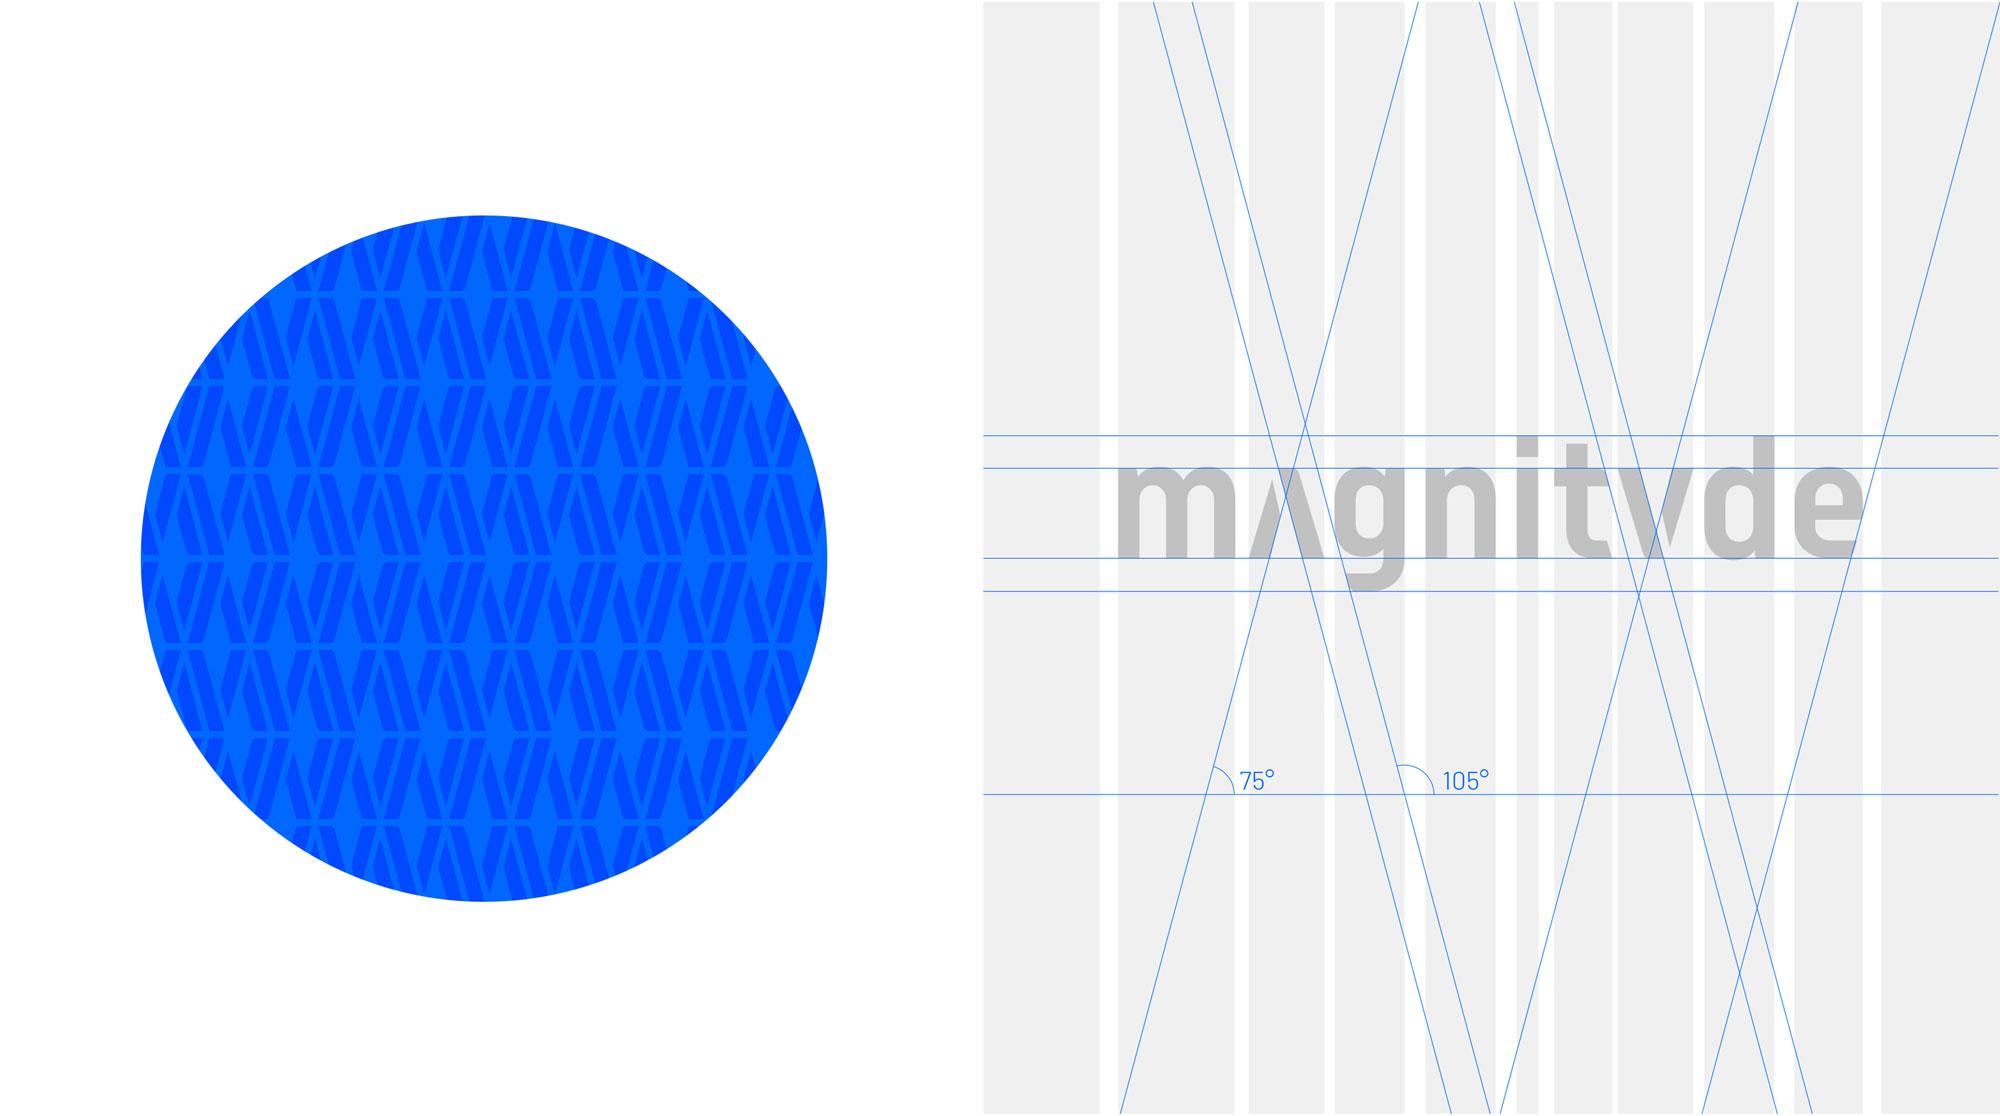 Magnitvde-serraysaez-graphic-design-8.jpg